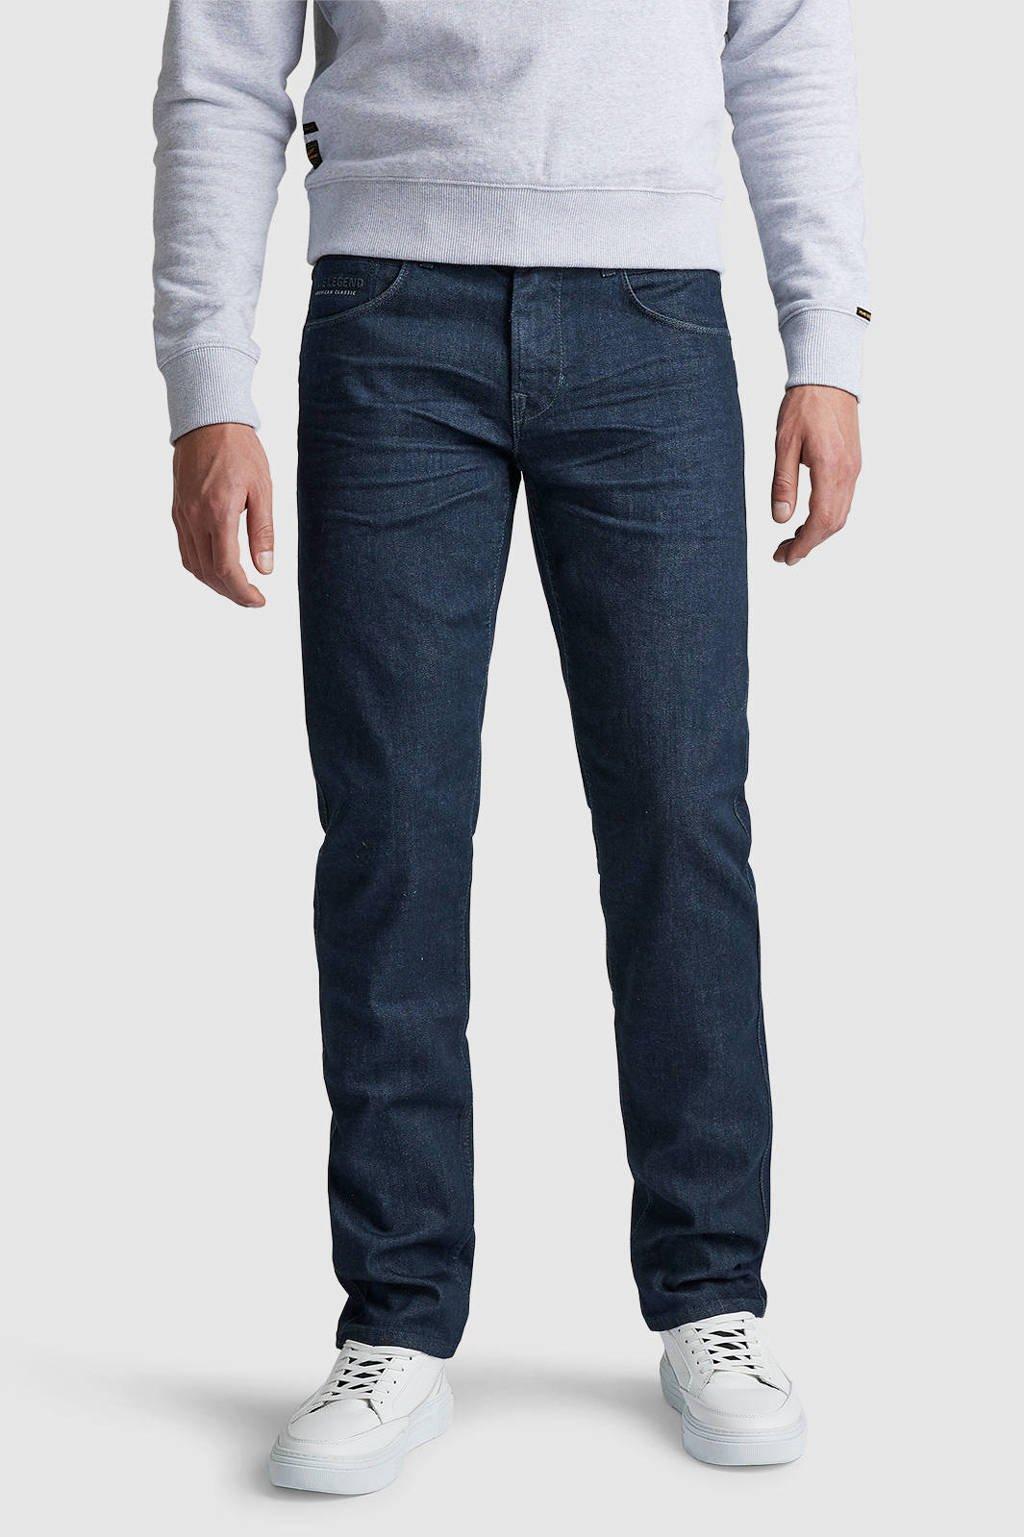 PME Legend slim straight fit jeans Nightflight dark denim, Dark denim